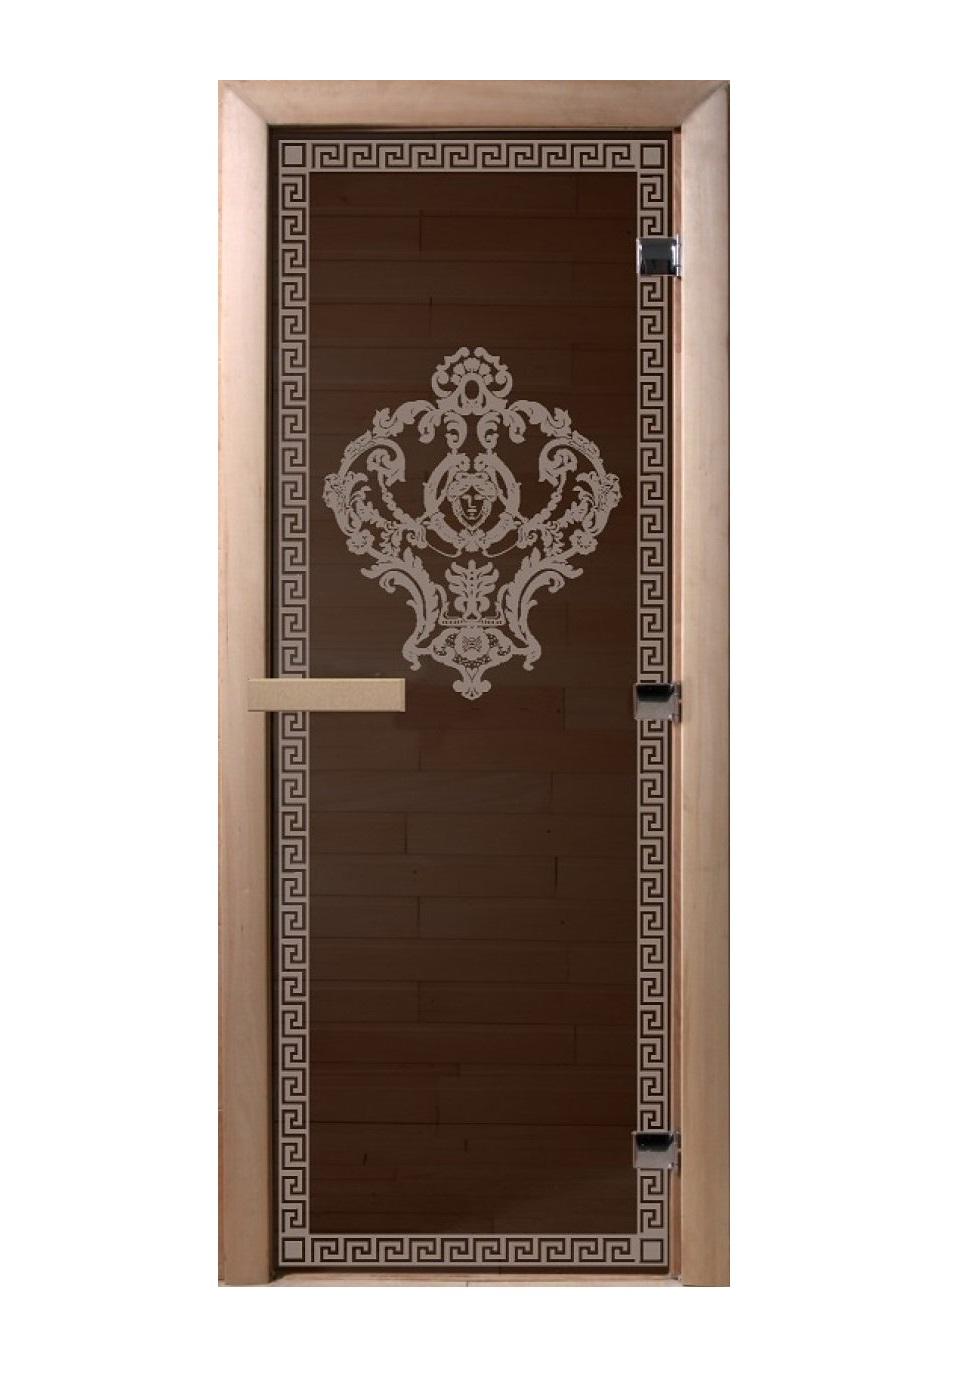 Дверь стеклянная для саун «Версаче» бронза 700х1900мм